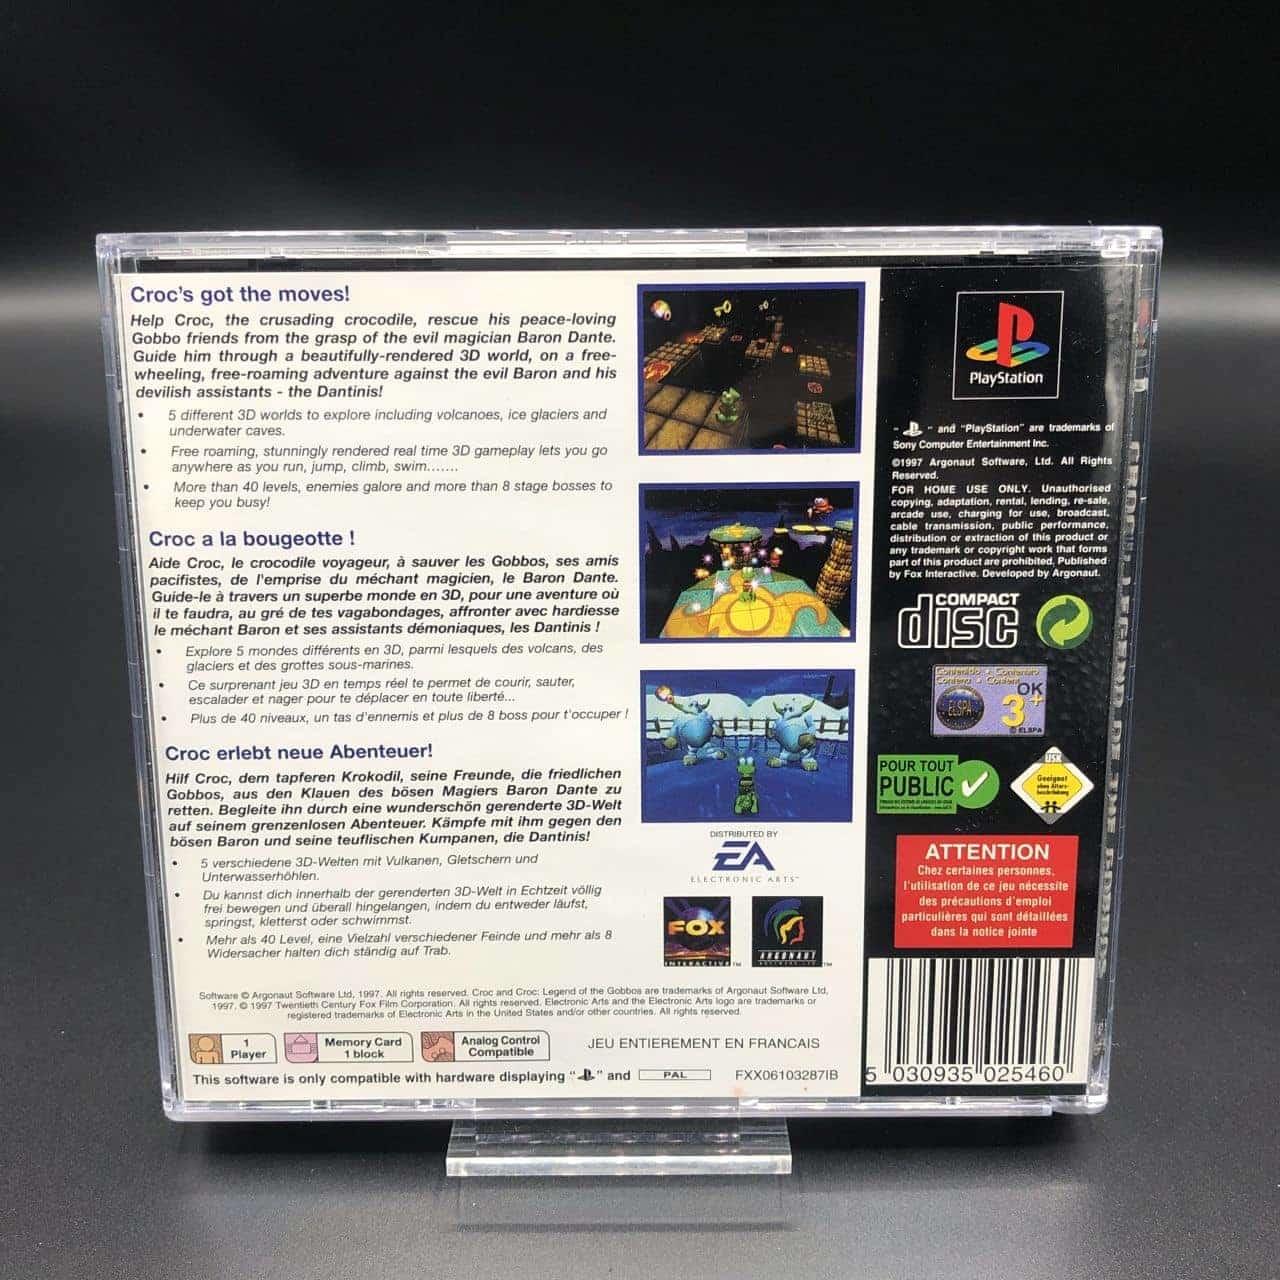 PS1 Croc: Legend of the Gobbos (Classics) (Komplett) (Gut) Sony PlayStation 1